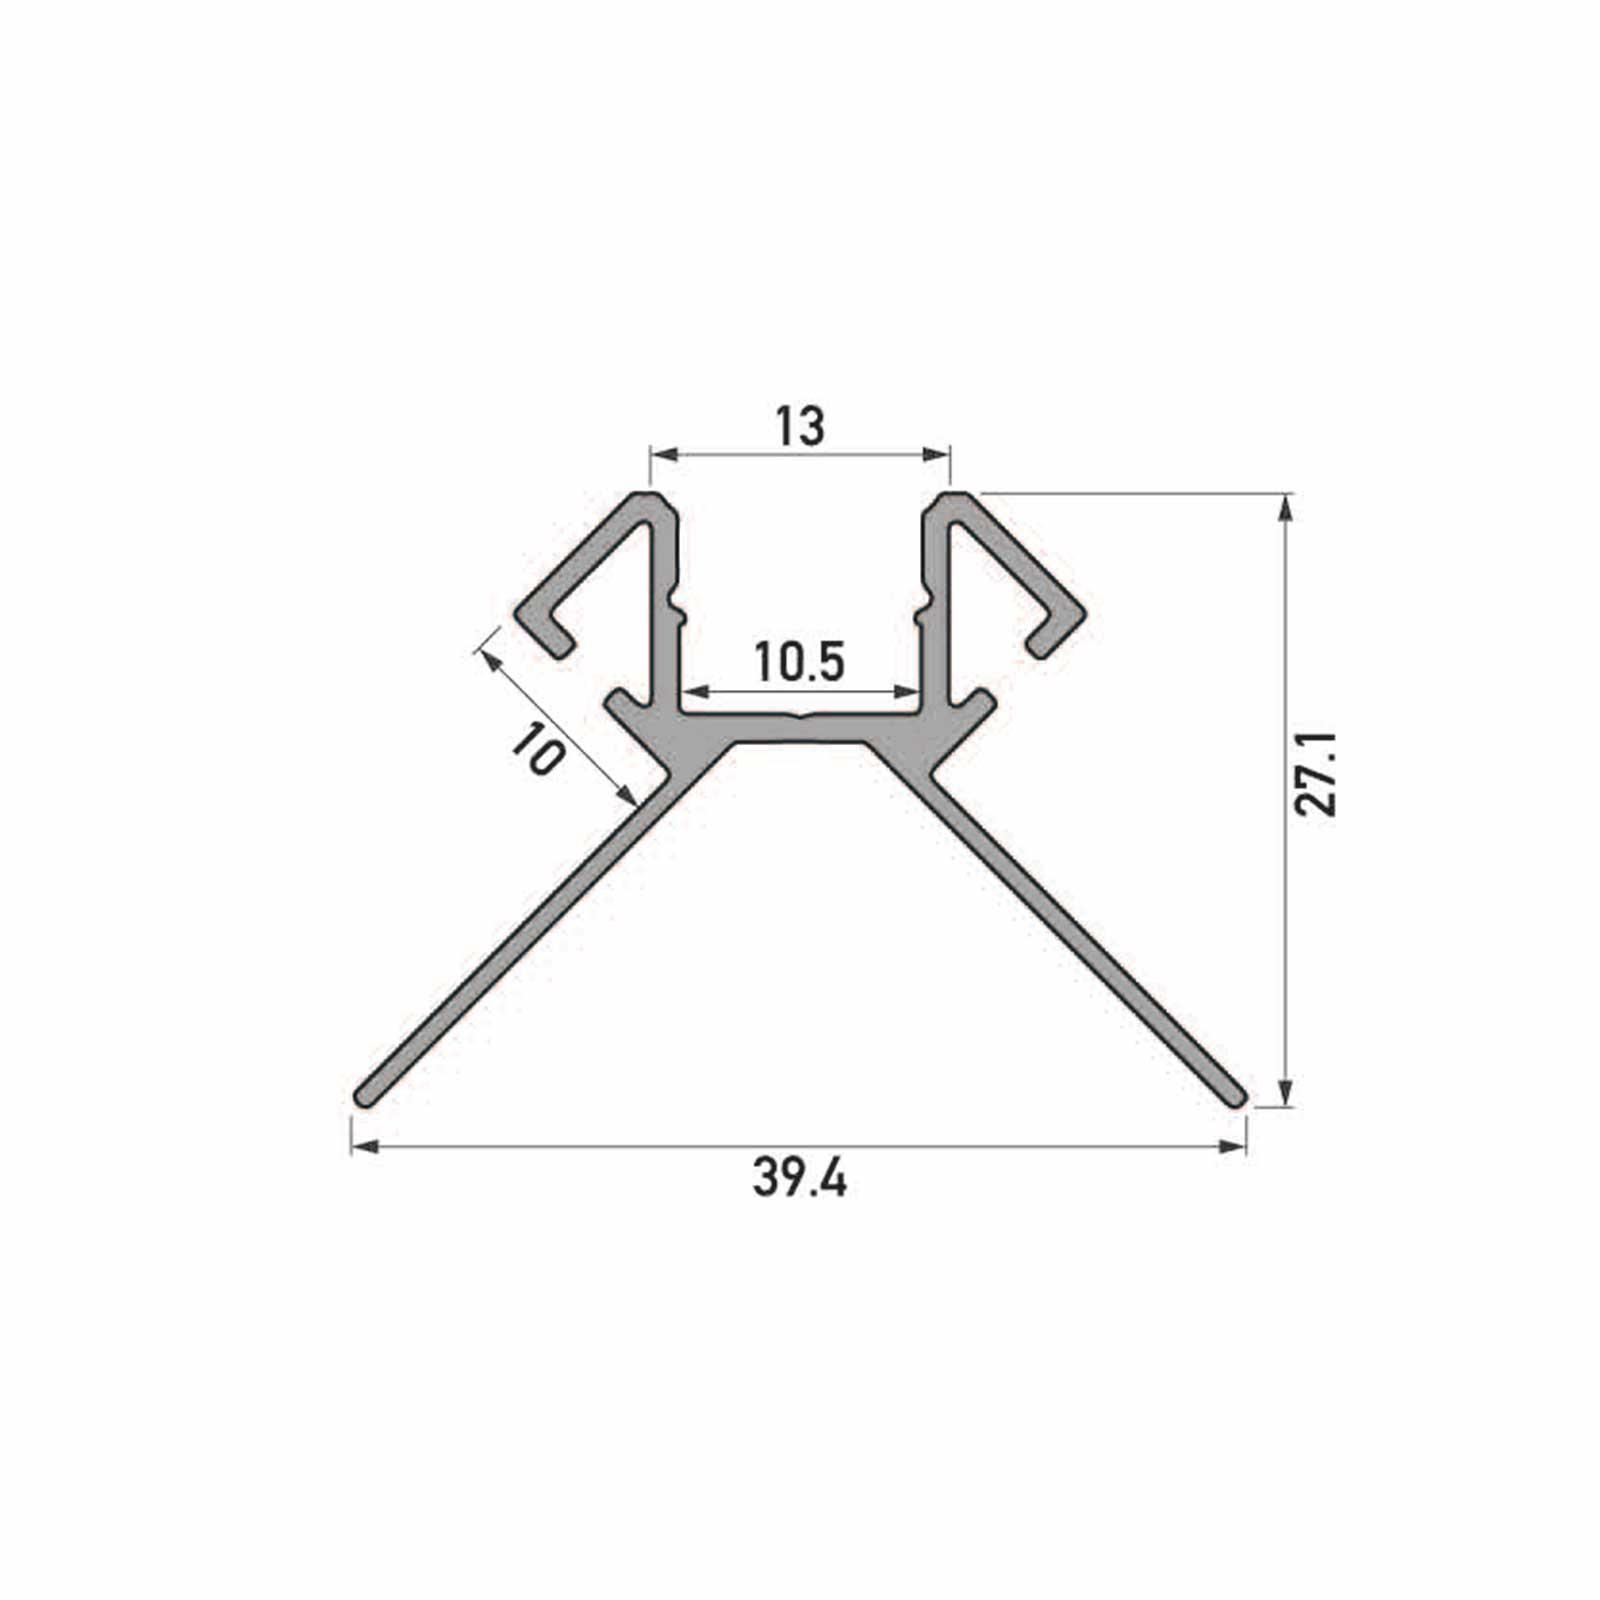 Skizze 2 Meter LED Außeneck-Aluprofil ARES (AR) für Trockenbau Rigipswand Fliesenspiegel